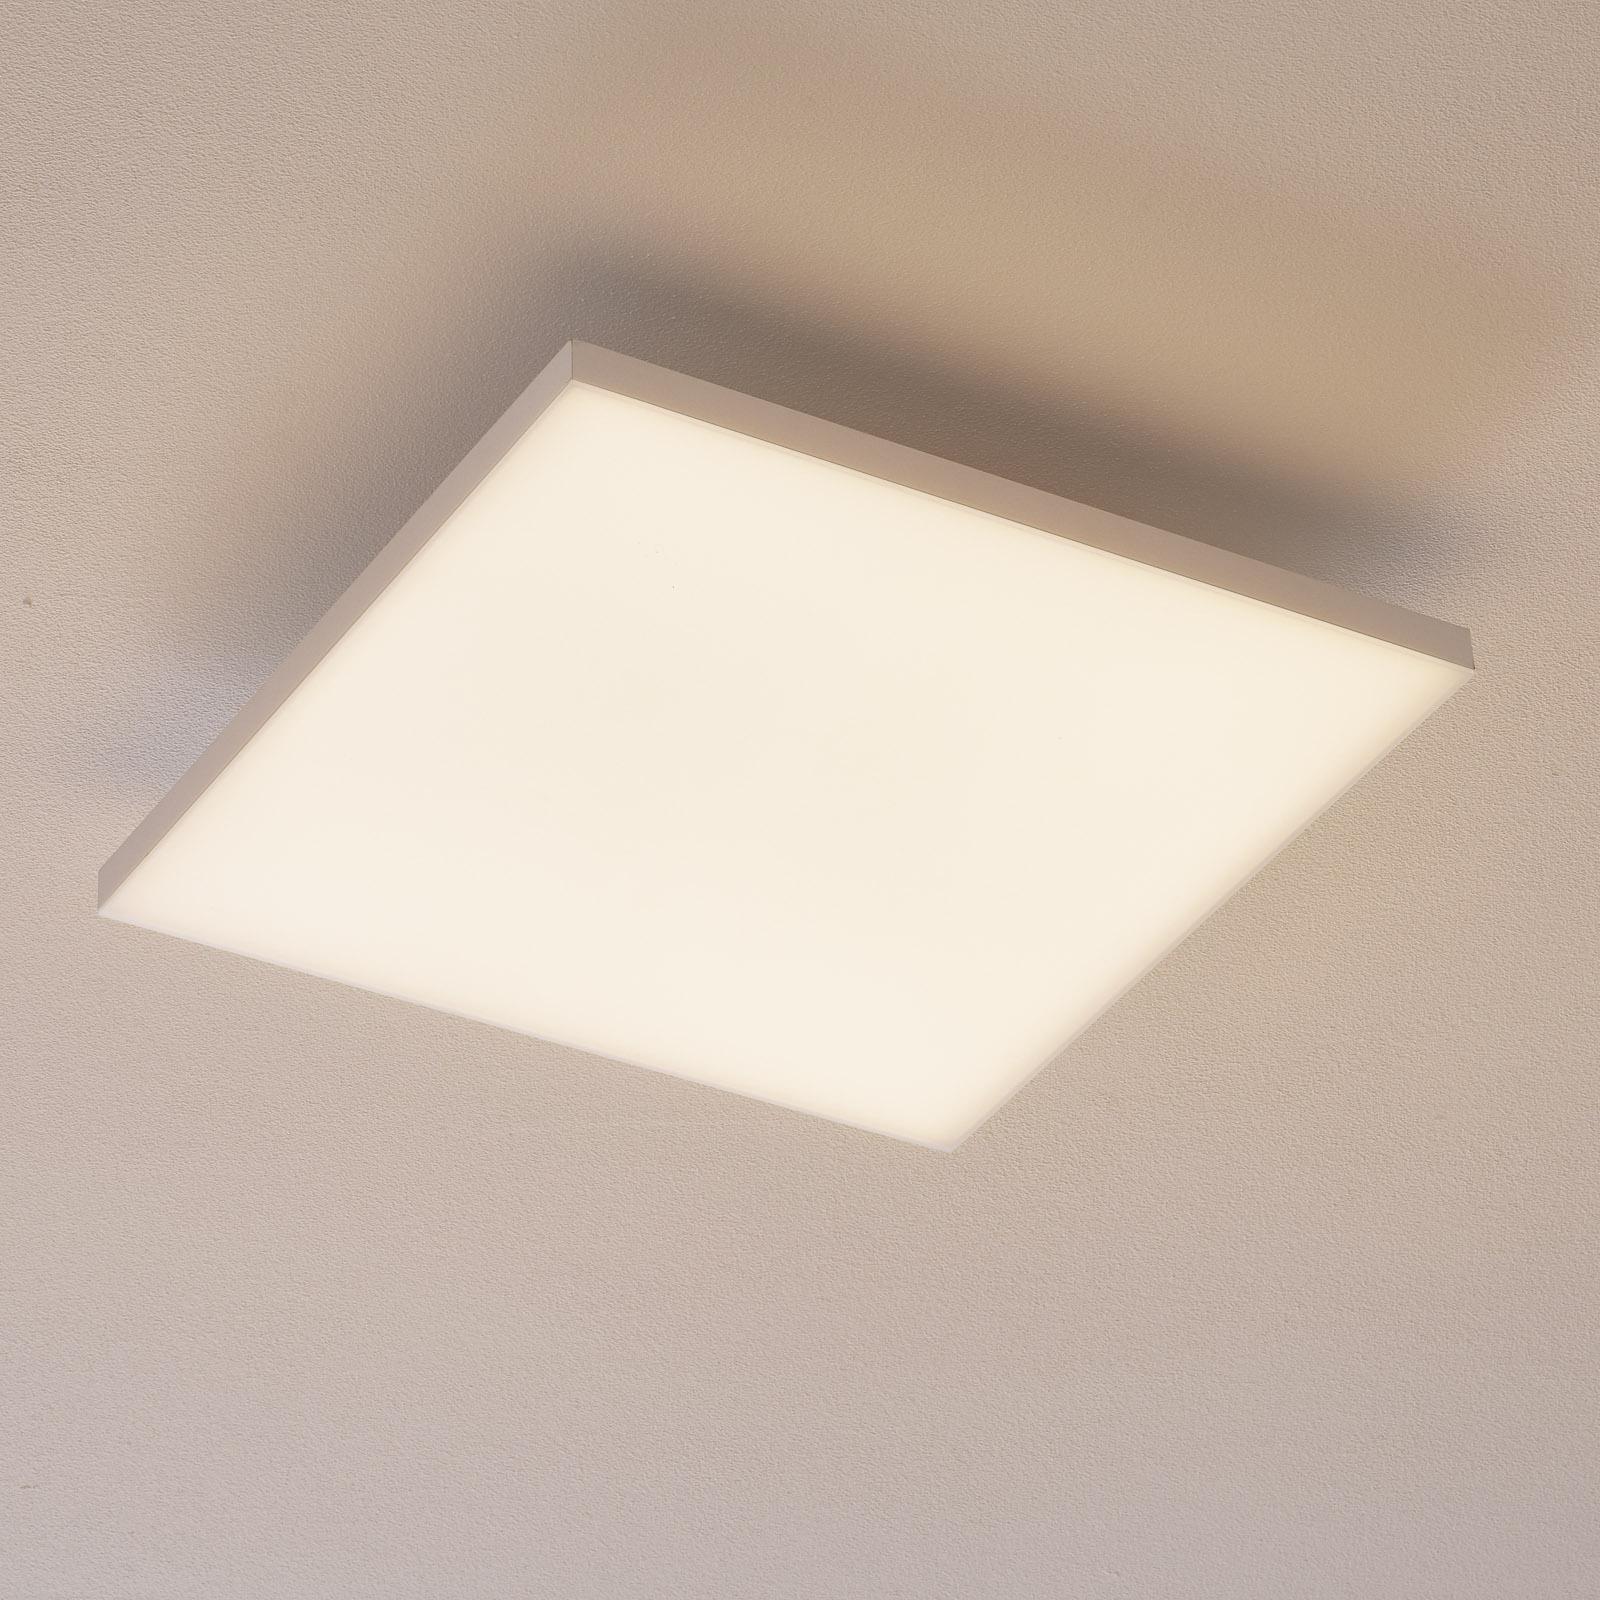 Paul Neuhaus Q-FRAMELESS plafondlamp RGBW 45x45cm